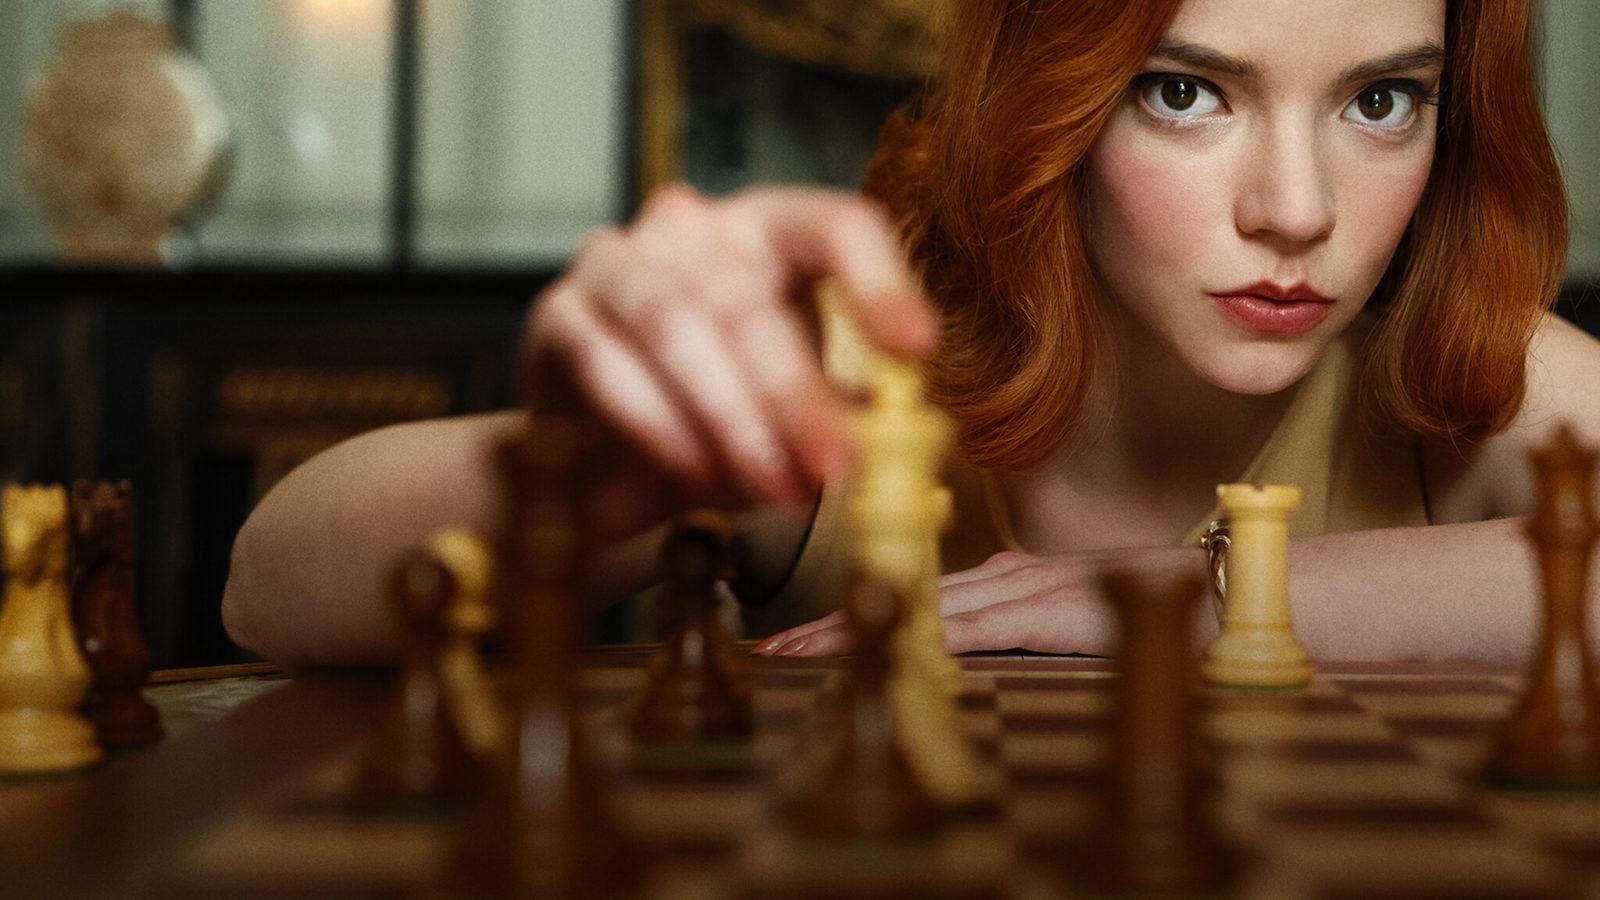 Riđa kosa – 5 saveta za negu